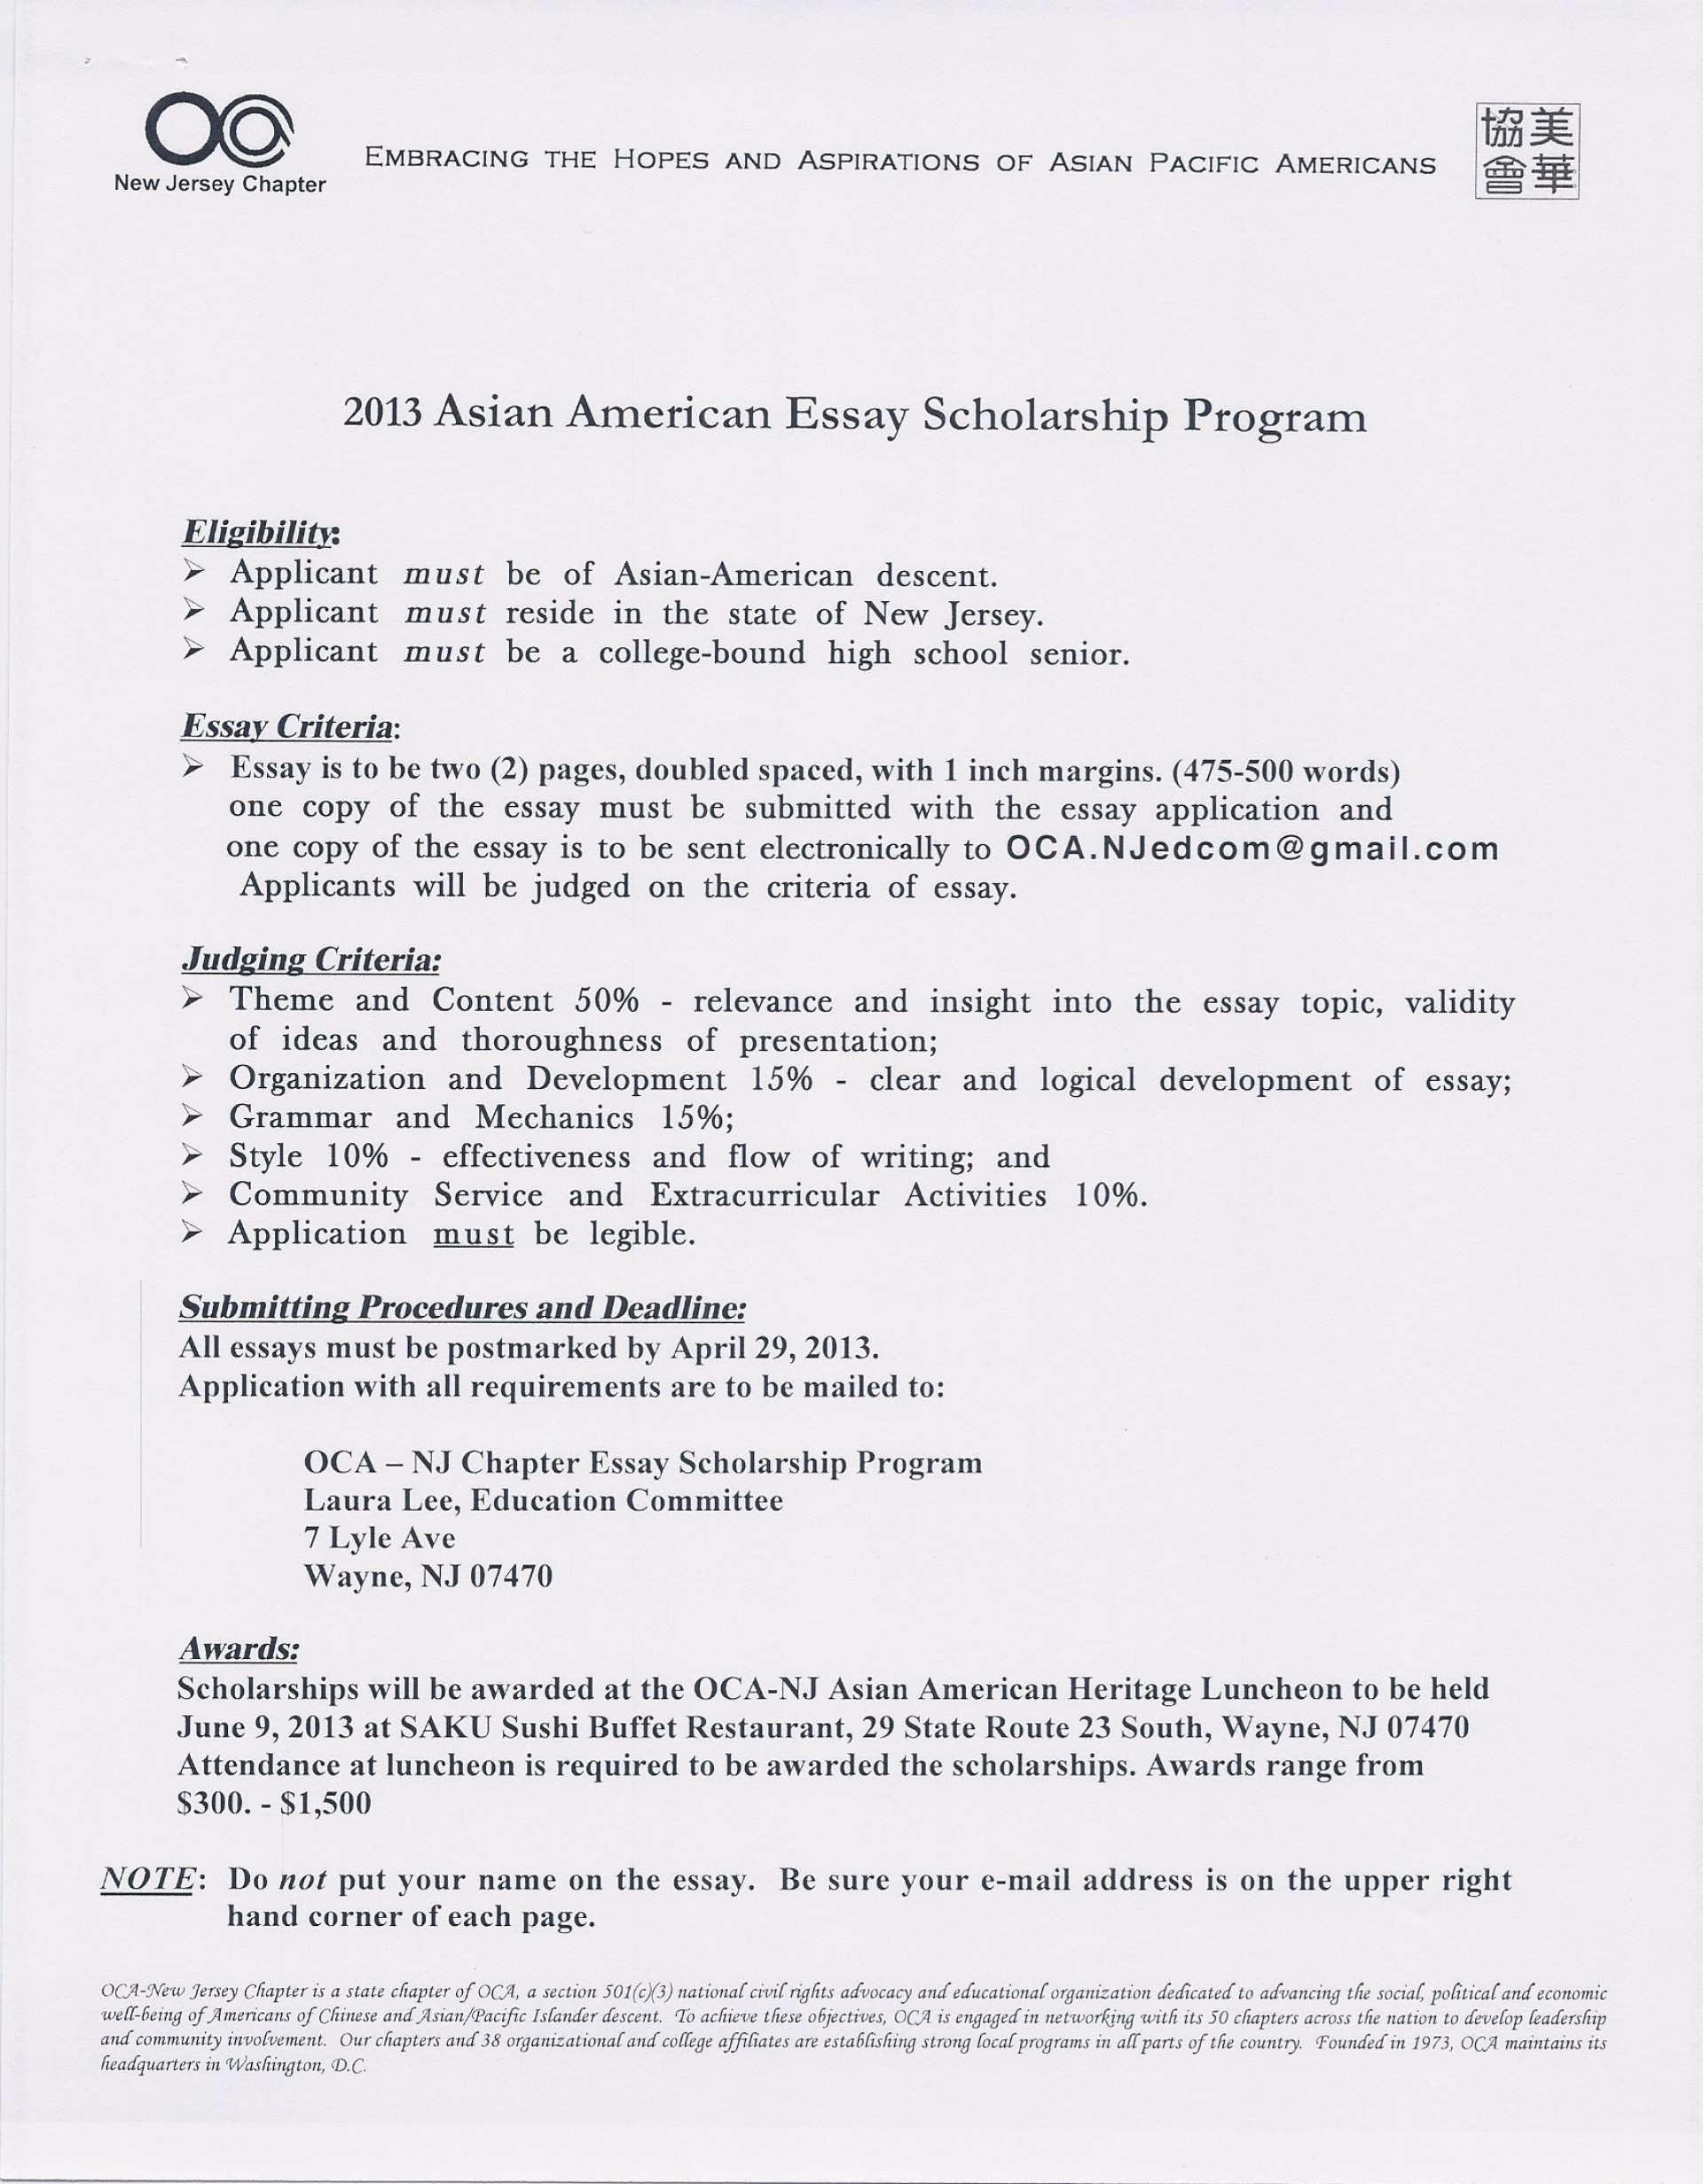 015 Essay Example Scholarship Tips Singular Gilman Psc Goldwater 1920